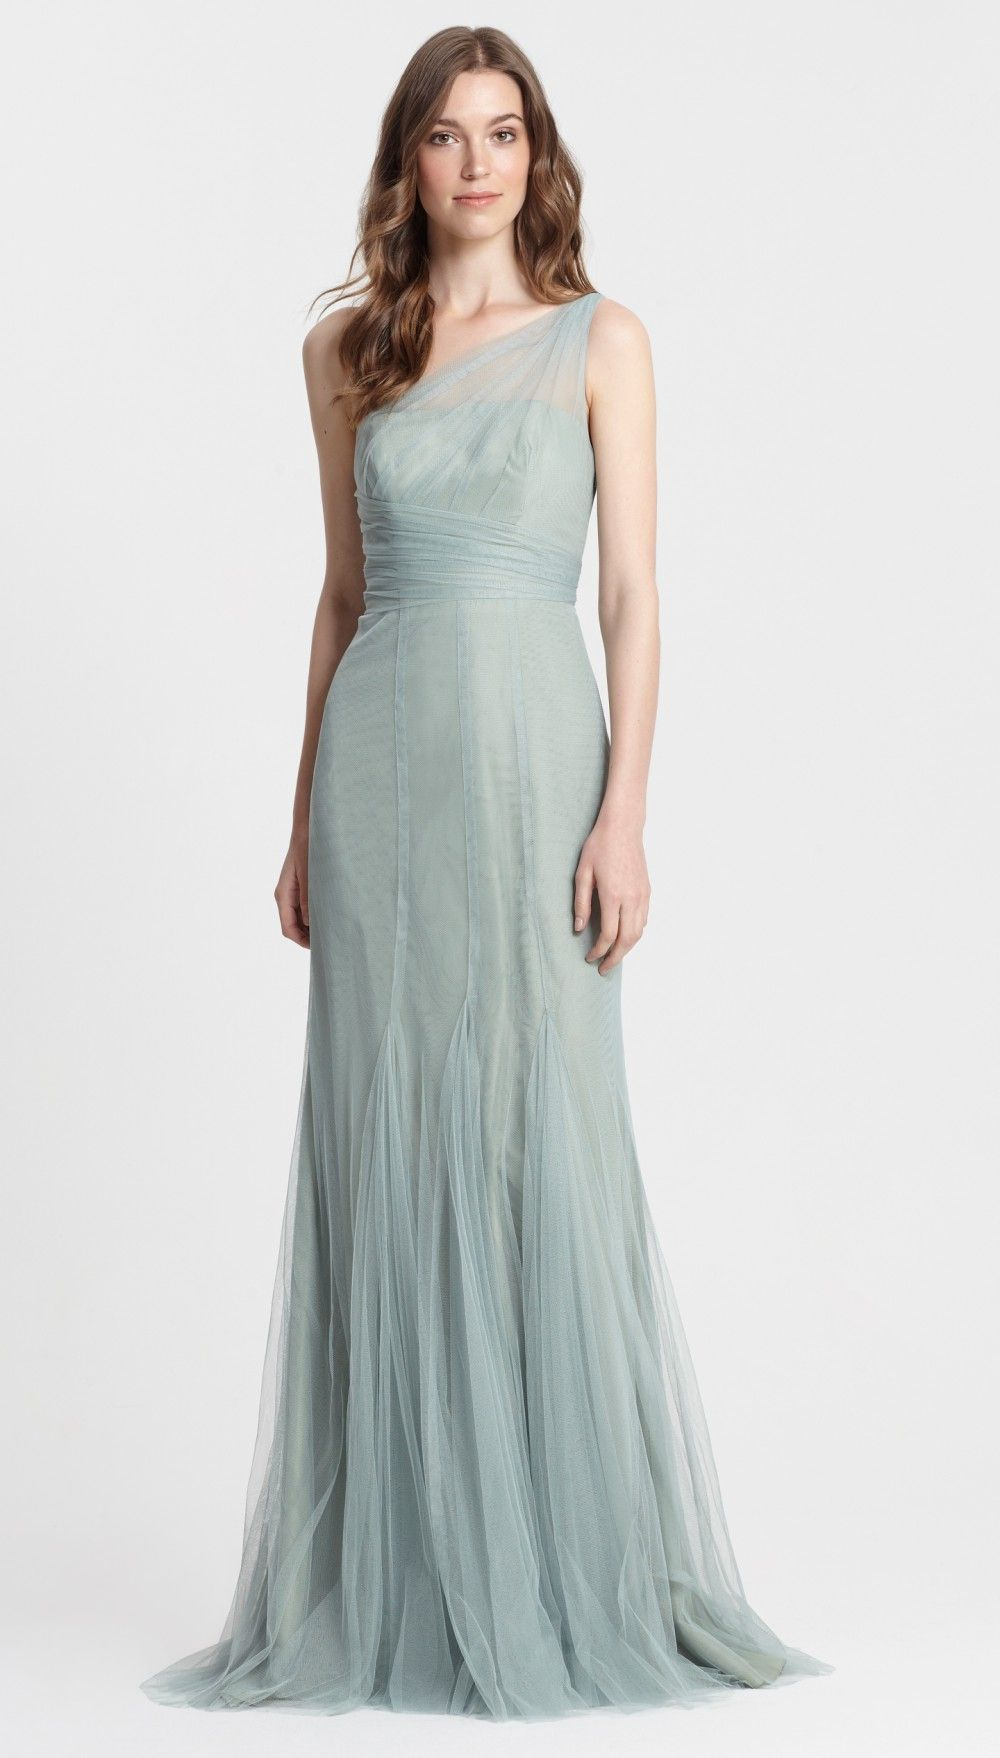 Monique lhuillier bridesmaid dresses for spring 2017 monique monique lhuillier bridesmaid dresses for spring 2017 ombrellifo Choice Image